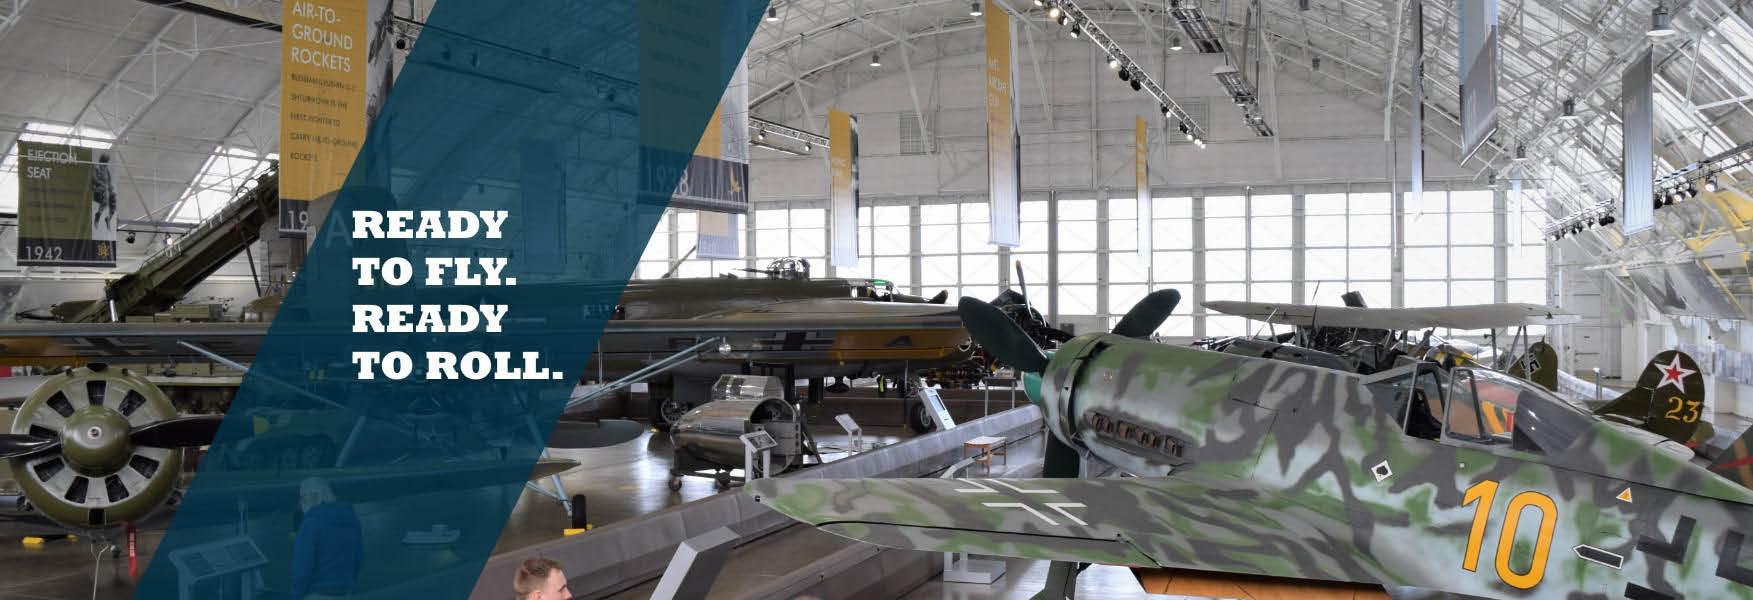 Flying Heritage & Combat Armor Museum main banner image - Everett, WA